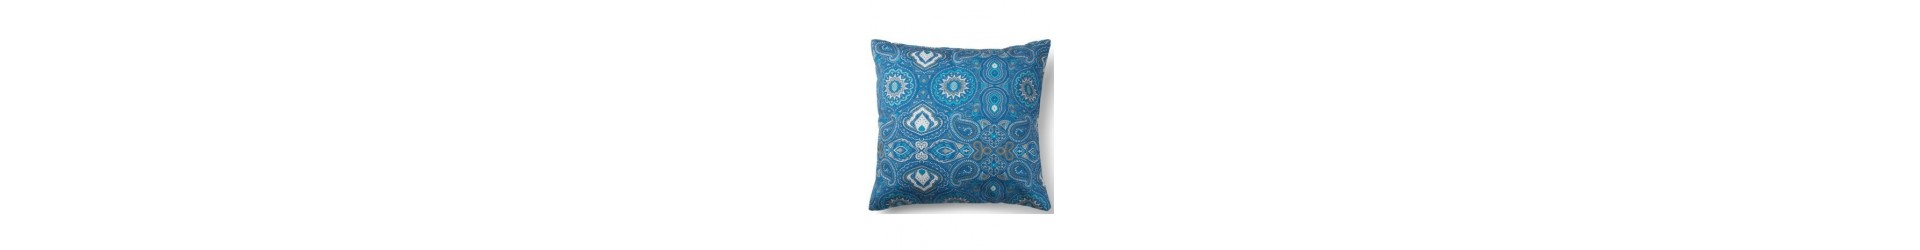 Livitalia Q&C quality and affordability, quality design furniture,